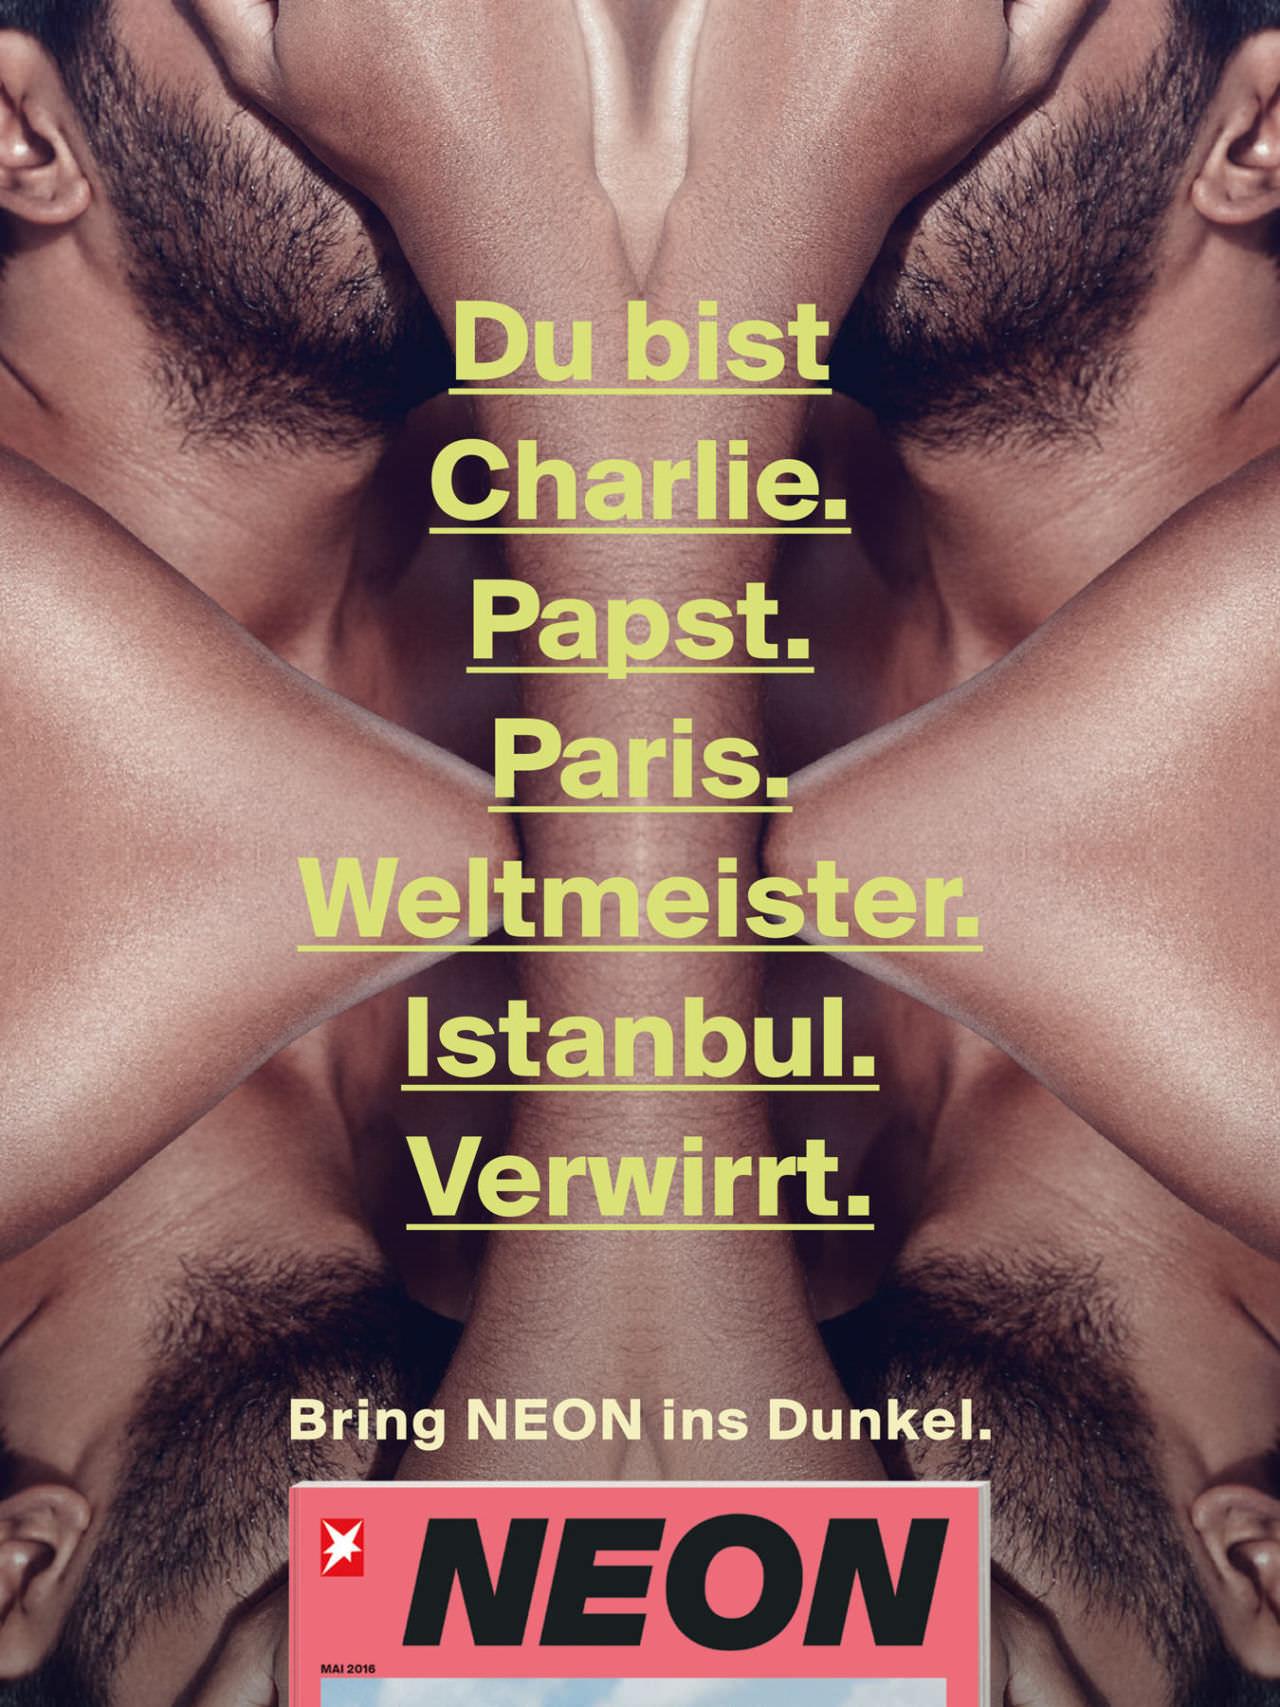 DAVID DAUB / HAMBURG GUJ / BRING NEON IN'S DUNKEL